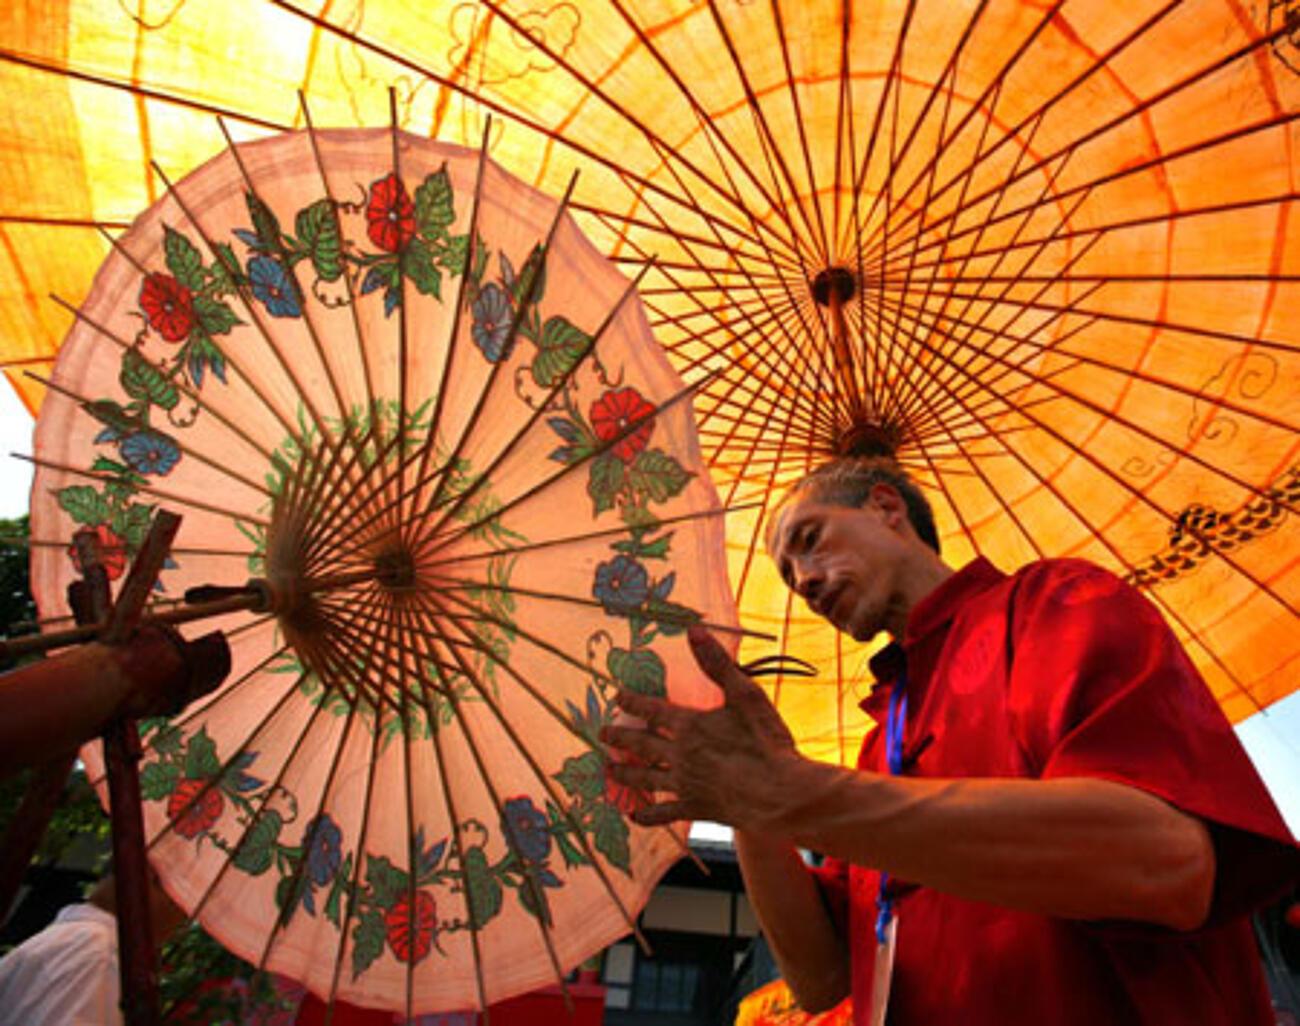 Schirmmacher in China